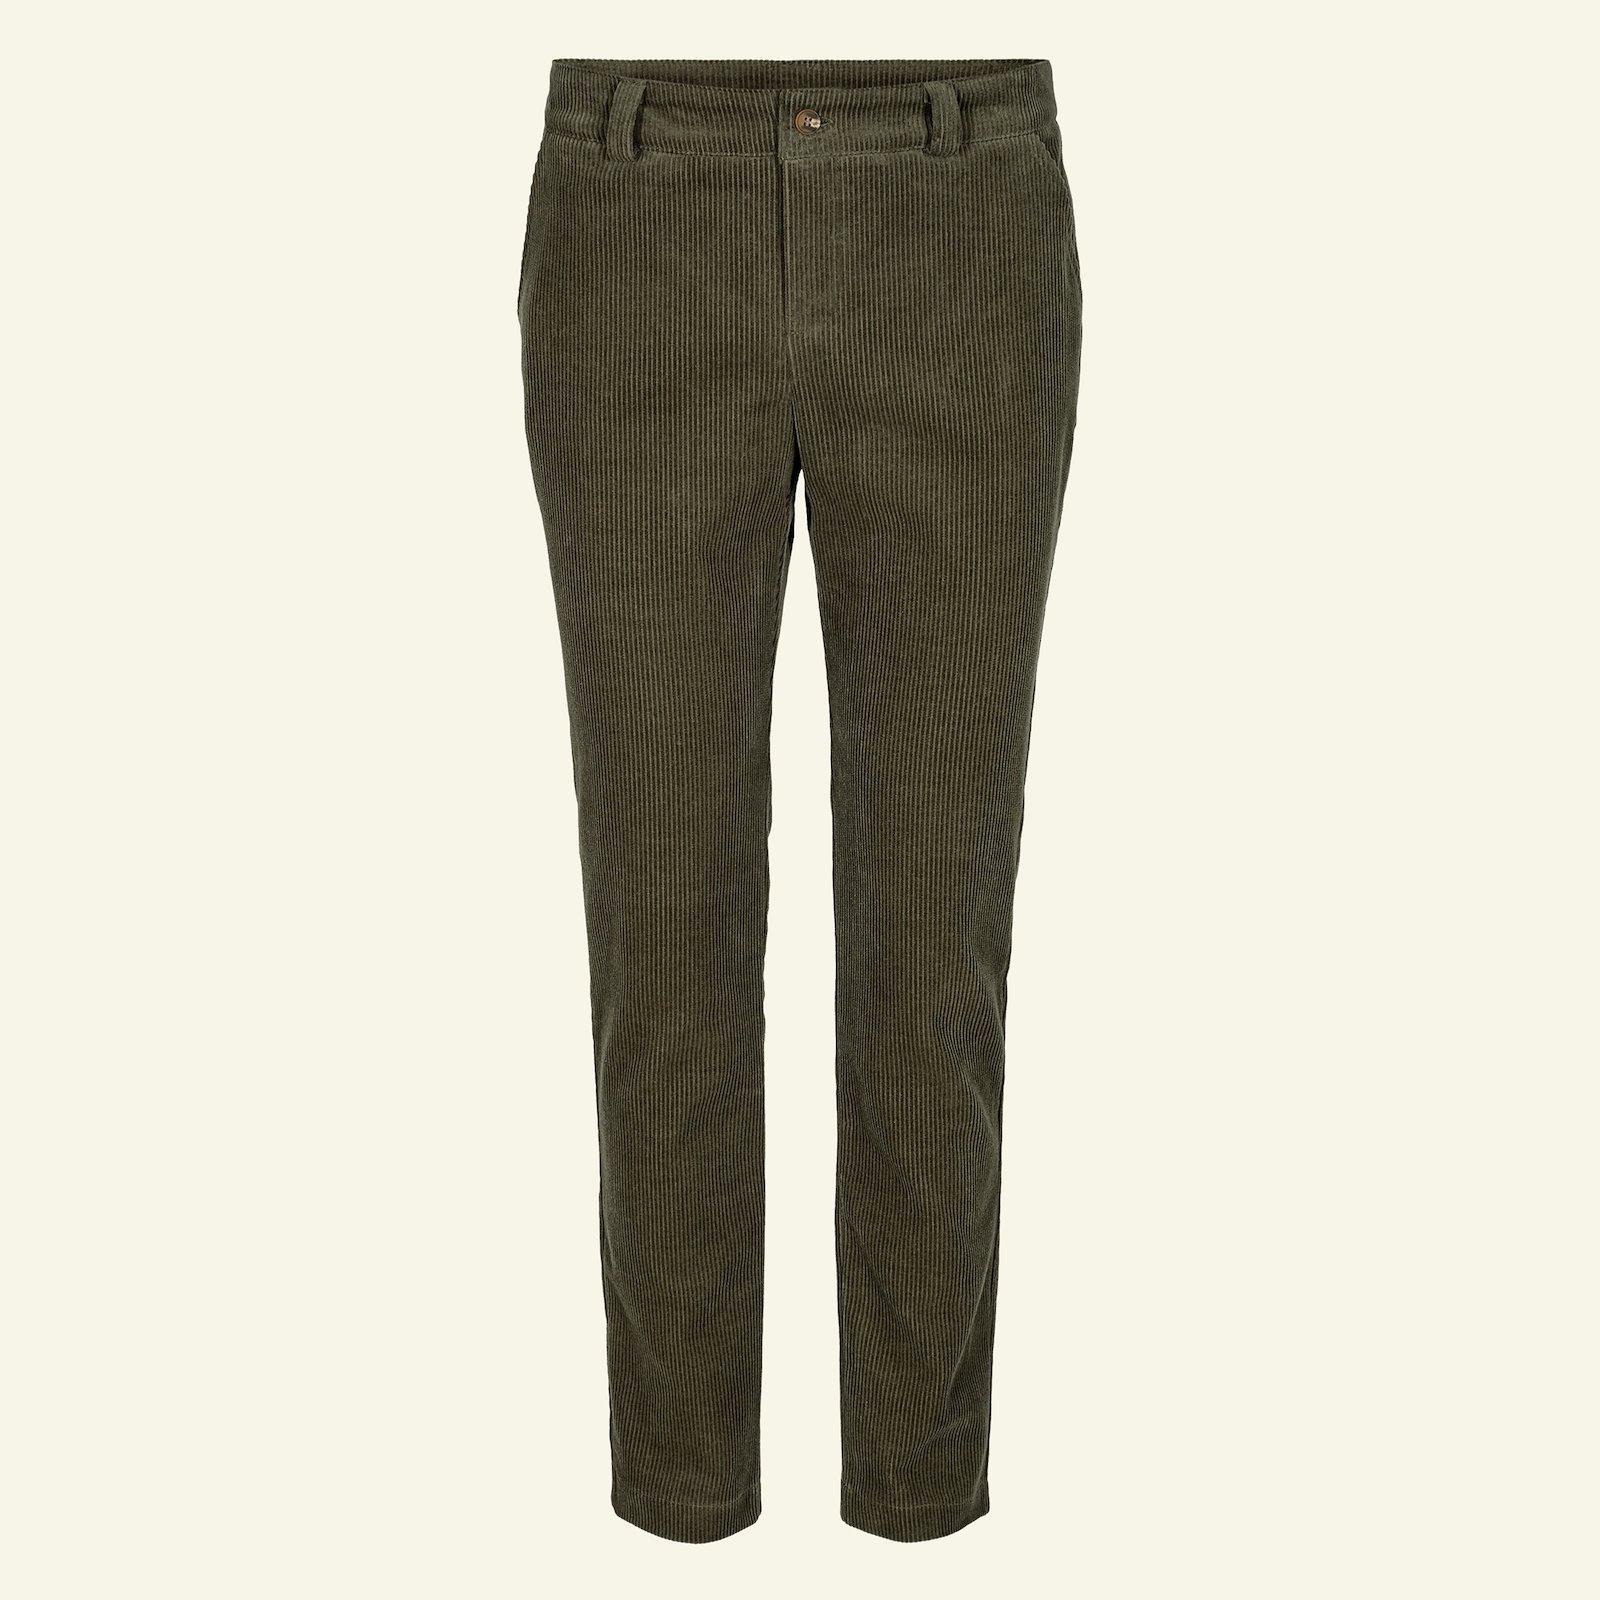 Trousers, 34/6 p20033_430000_sskit